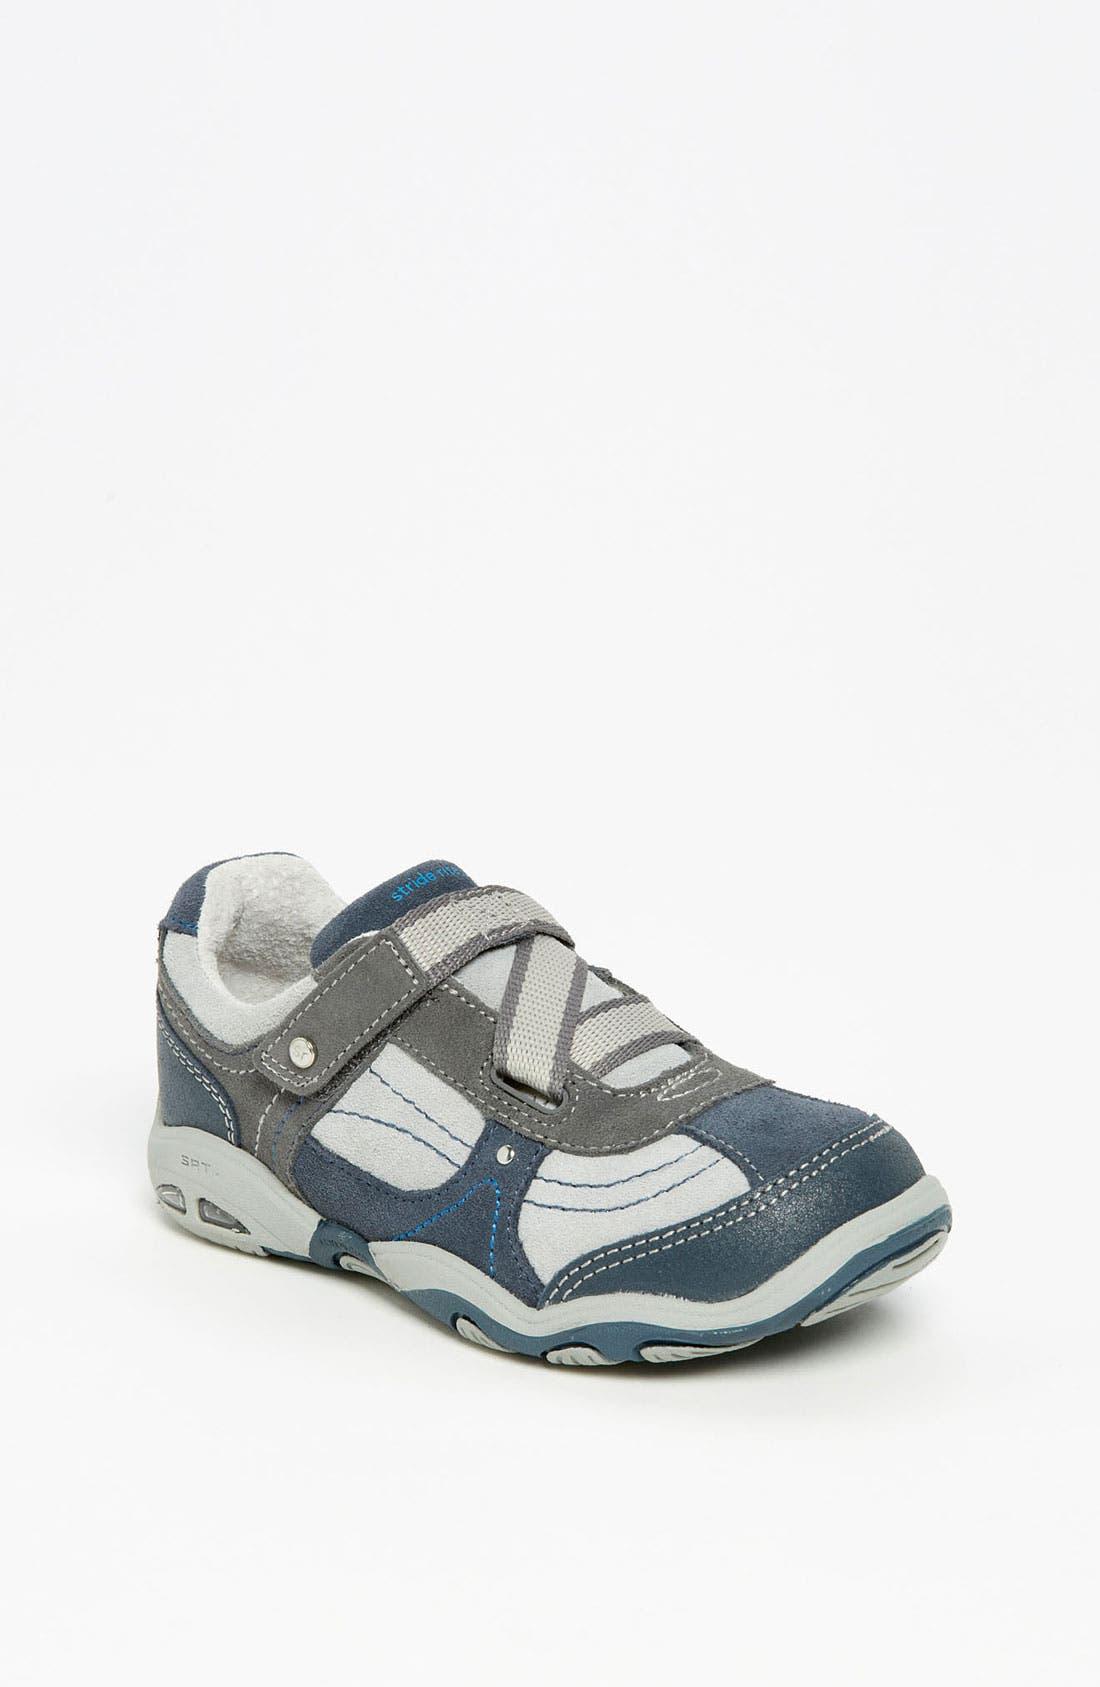 Main Image - Stride Rite 'Chad' Sneaker (Toddler & Little Kid)